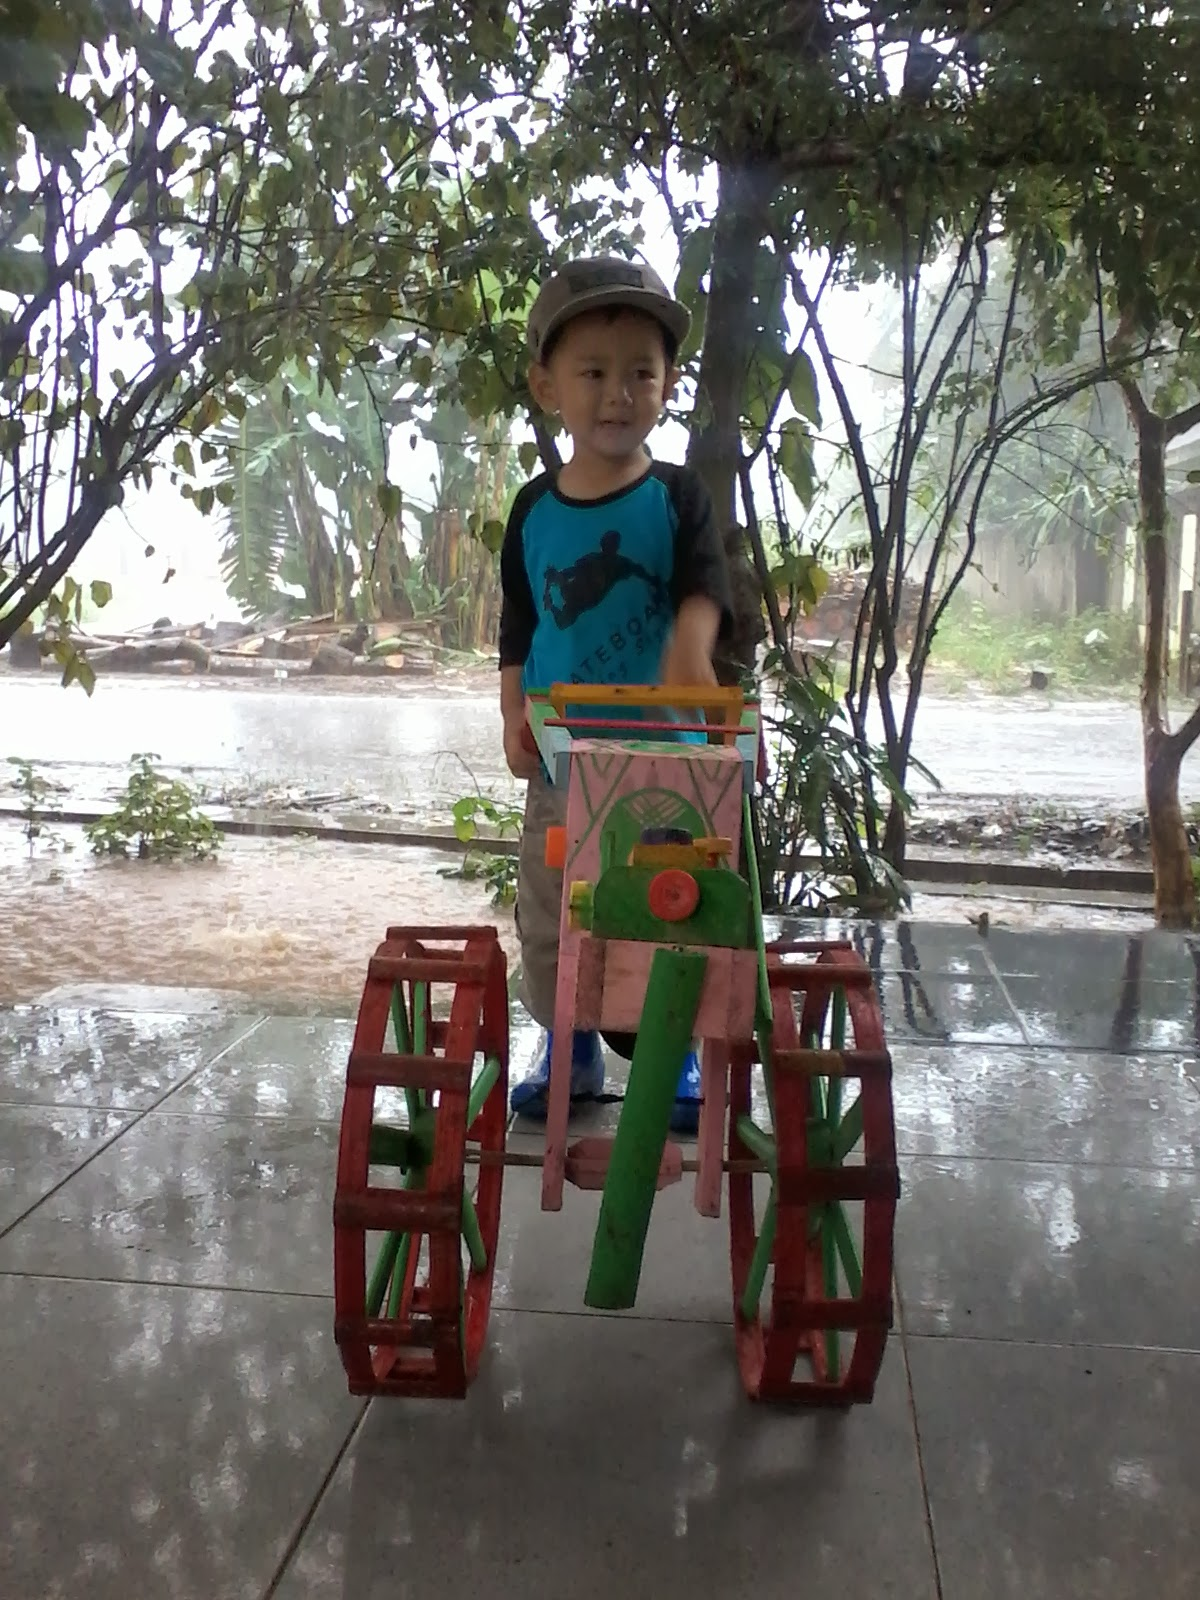 harga traktor mainan